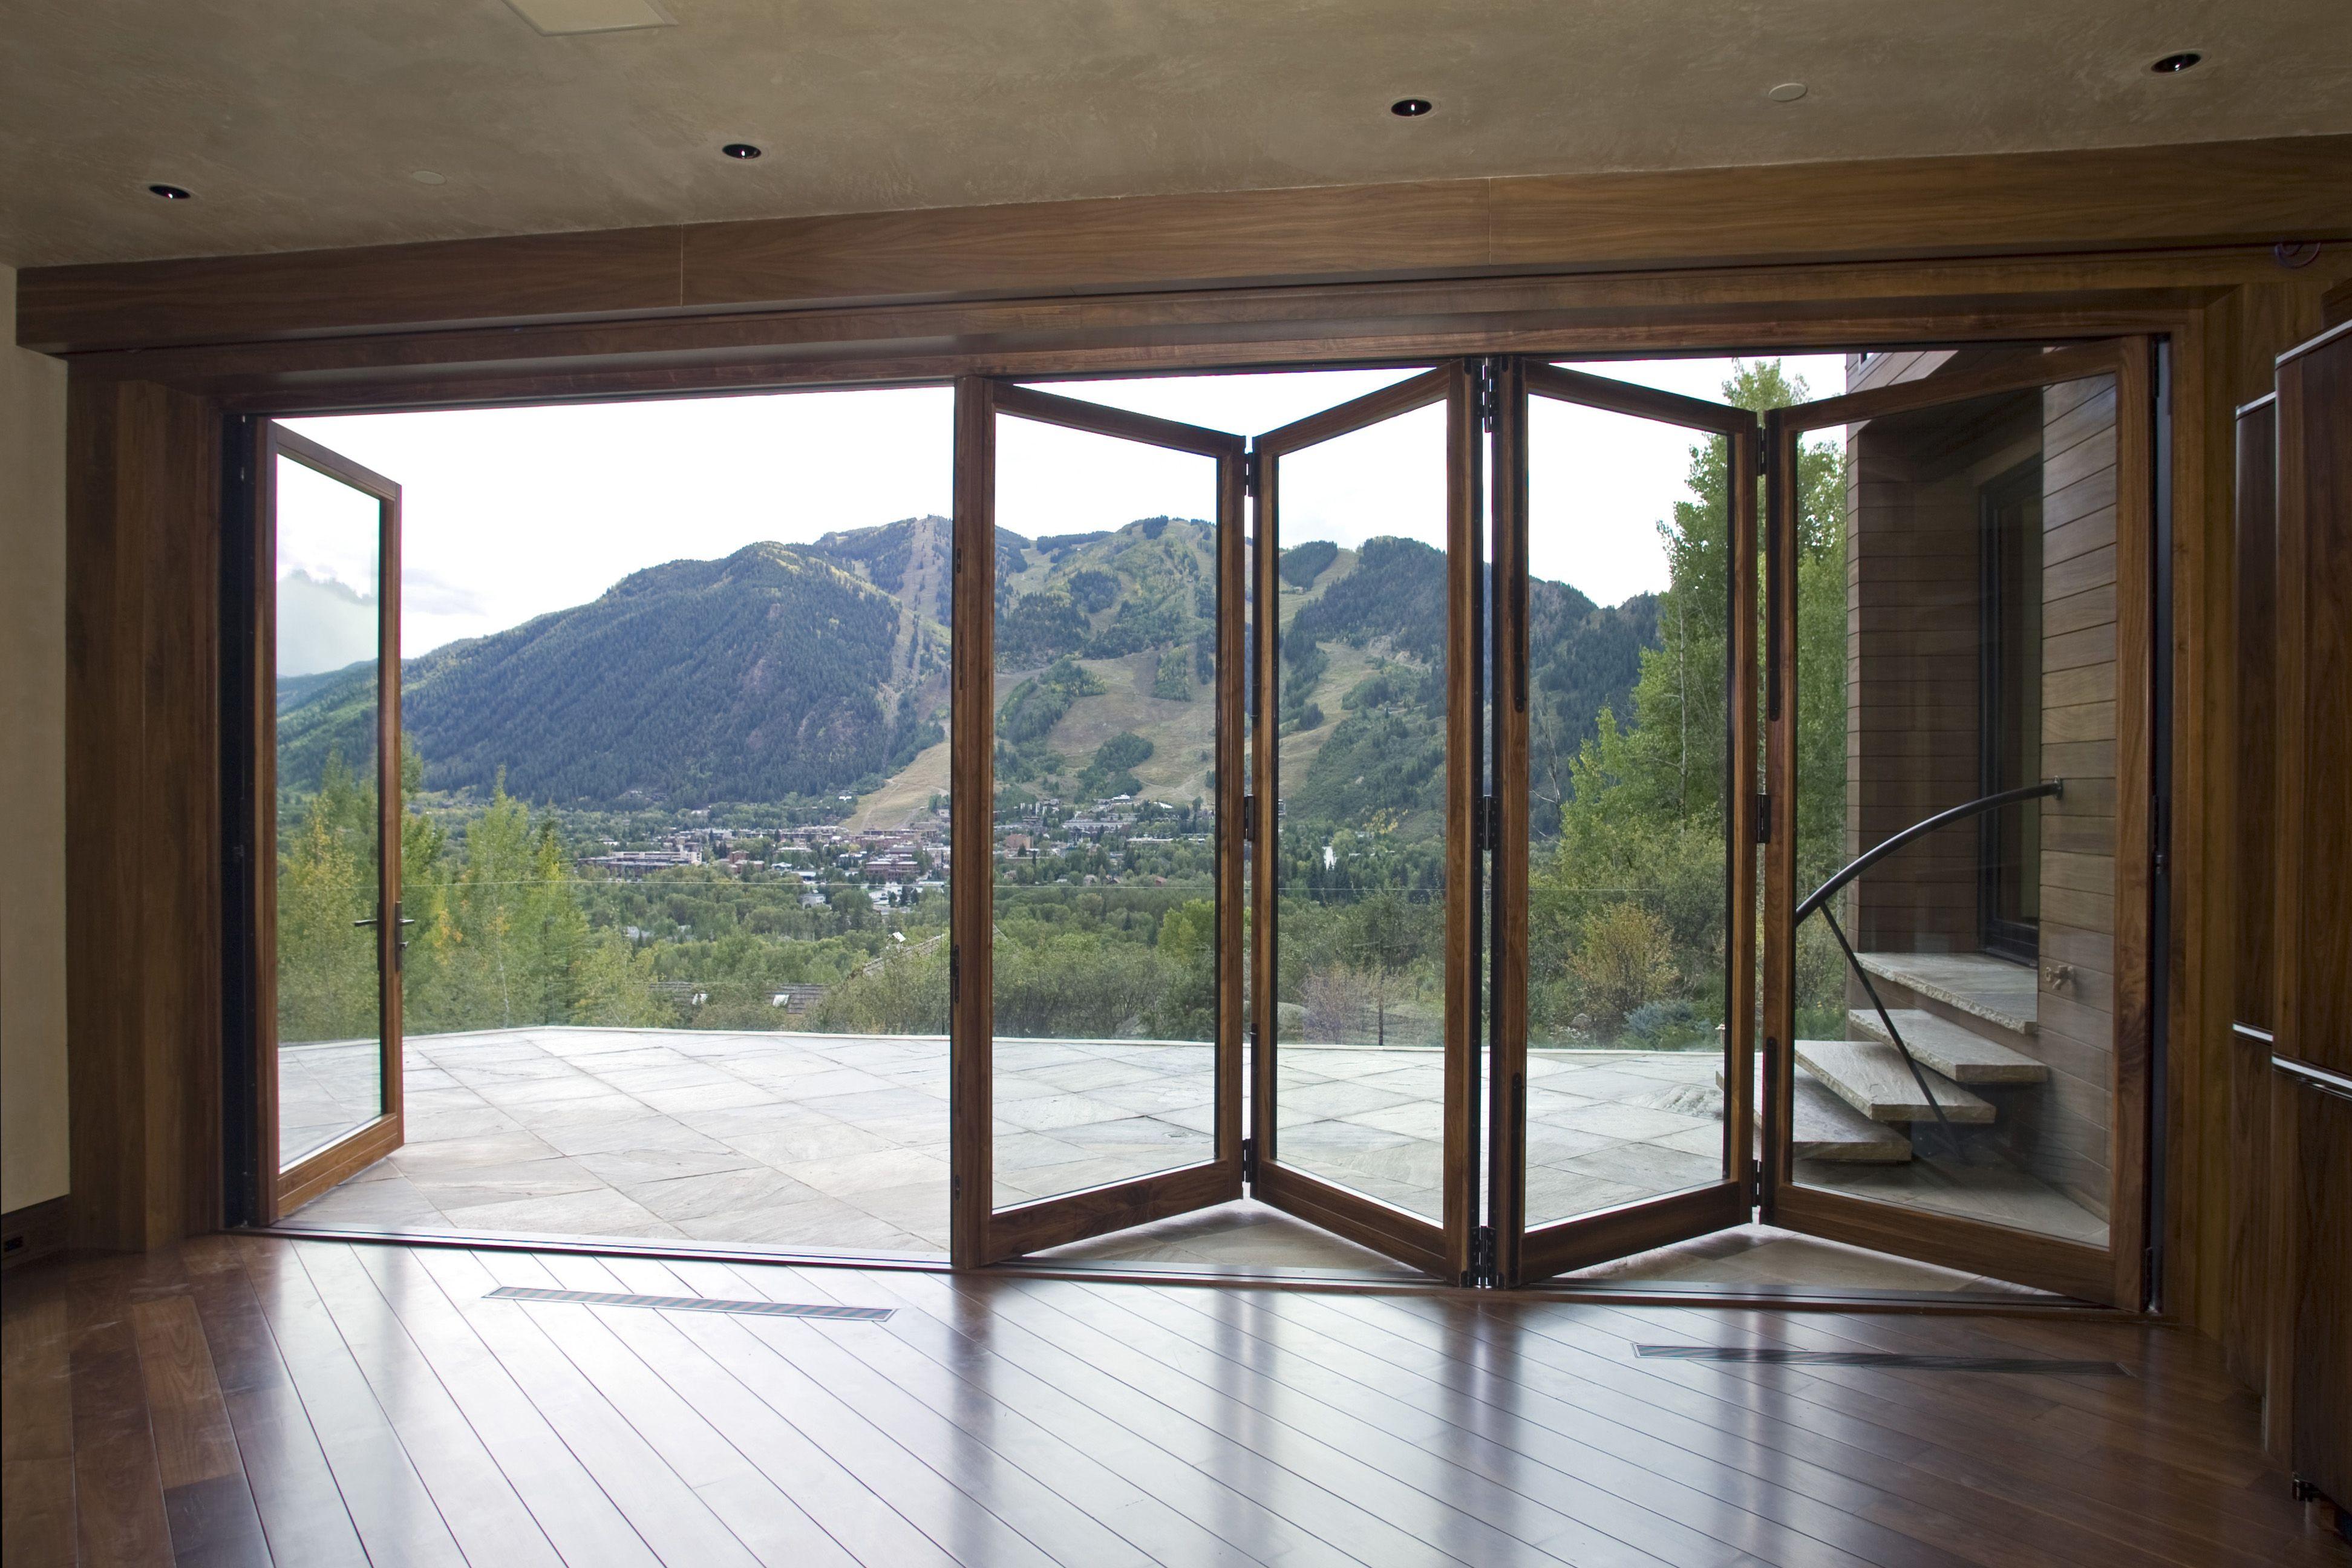 Grabill Windows Doors Distinctive Architectural Designs Glass Doors Patio Exterior Doors With Glass Folding Patio Doors